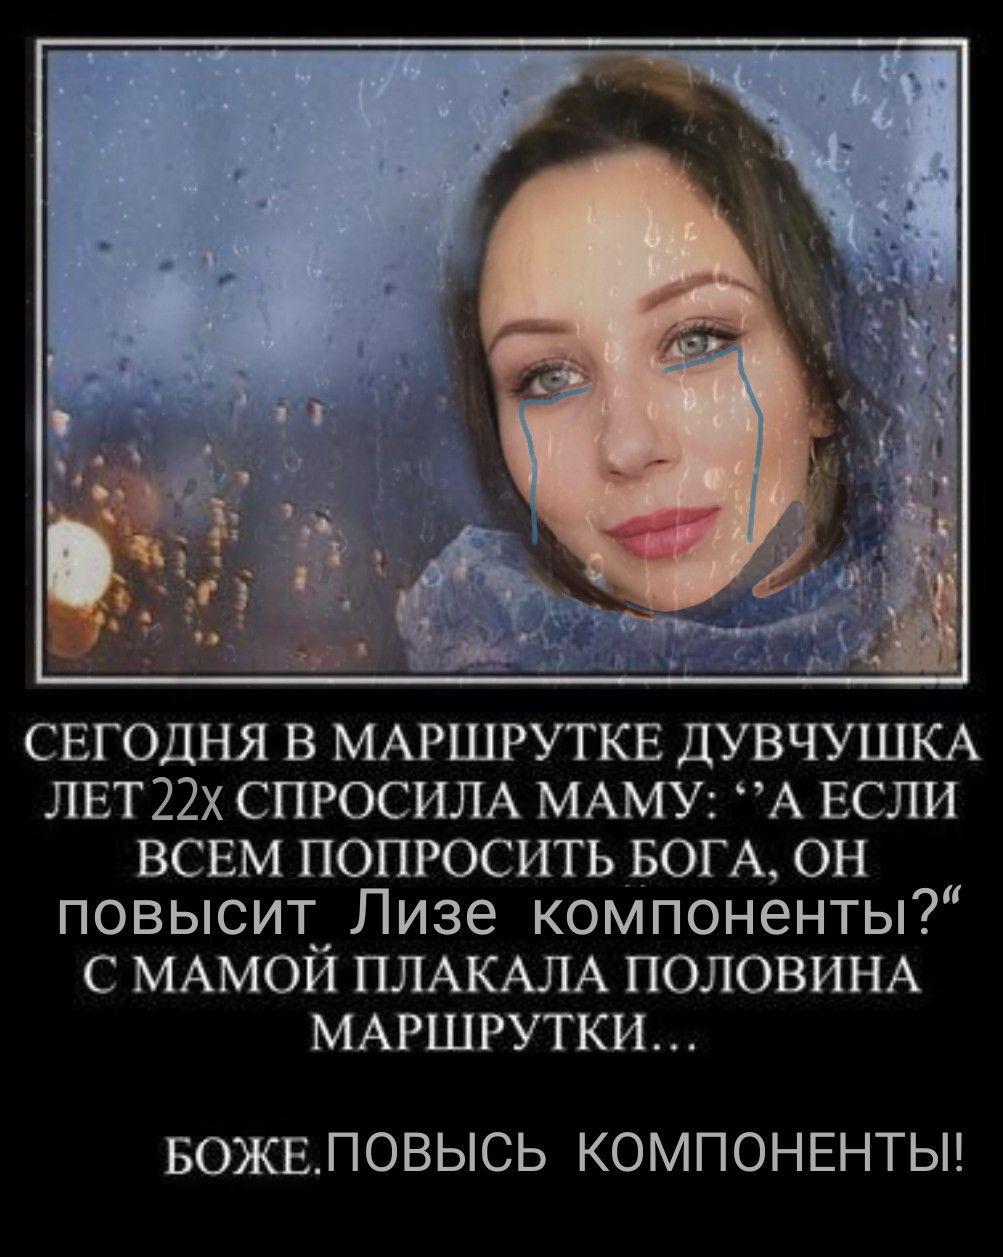 Елизавета Туктамышева & Андрей Лазукин - 5 - Страница 4 1040_10000_max